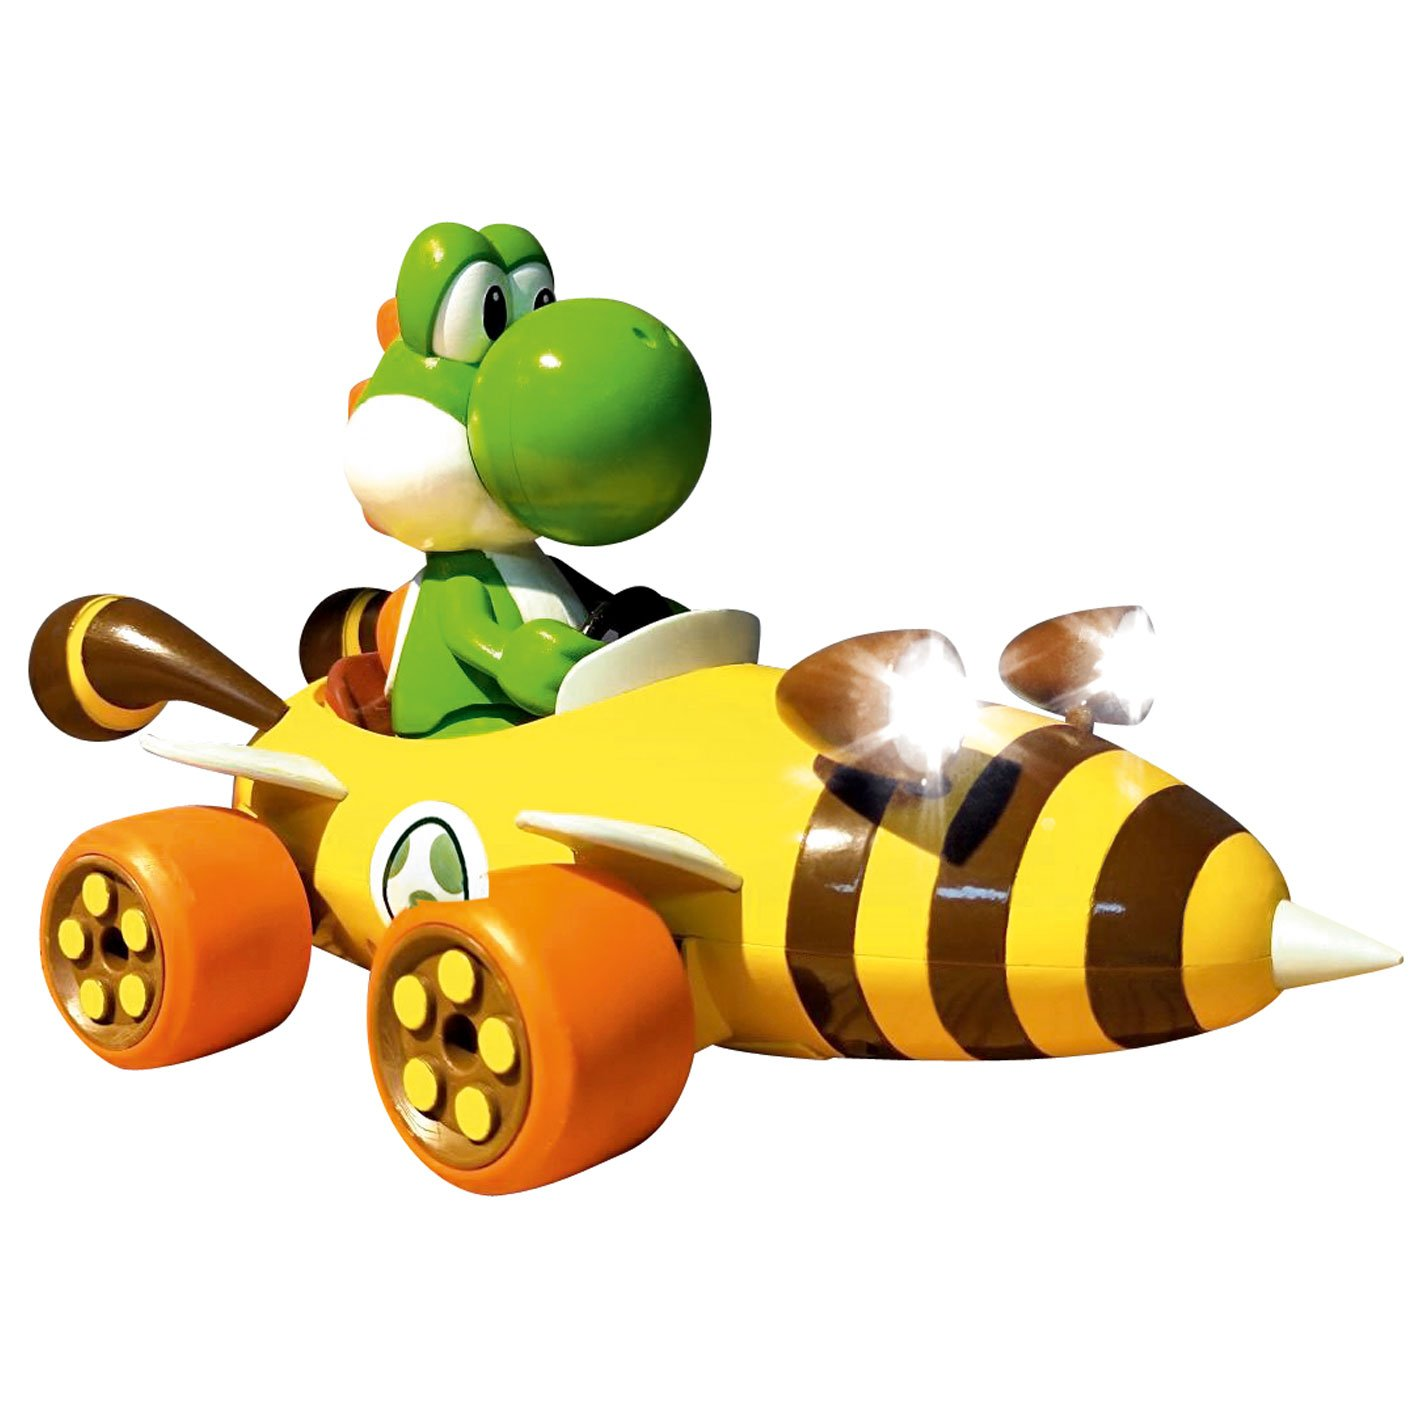 Carrera - Nintendo RC Car - Mario Kart Bumble V - Yoshi (370181065)